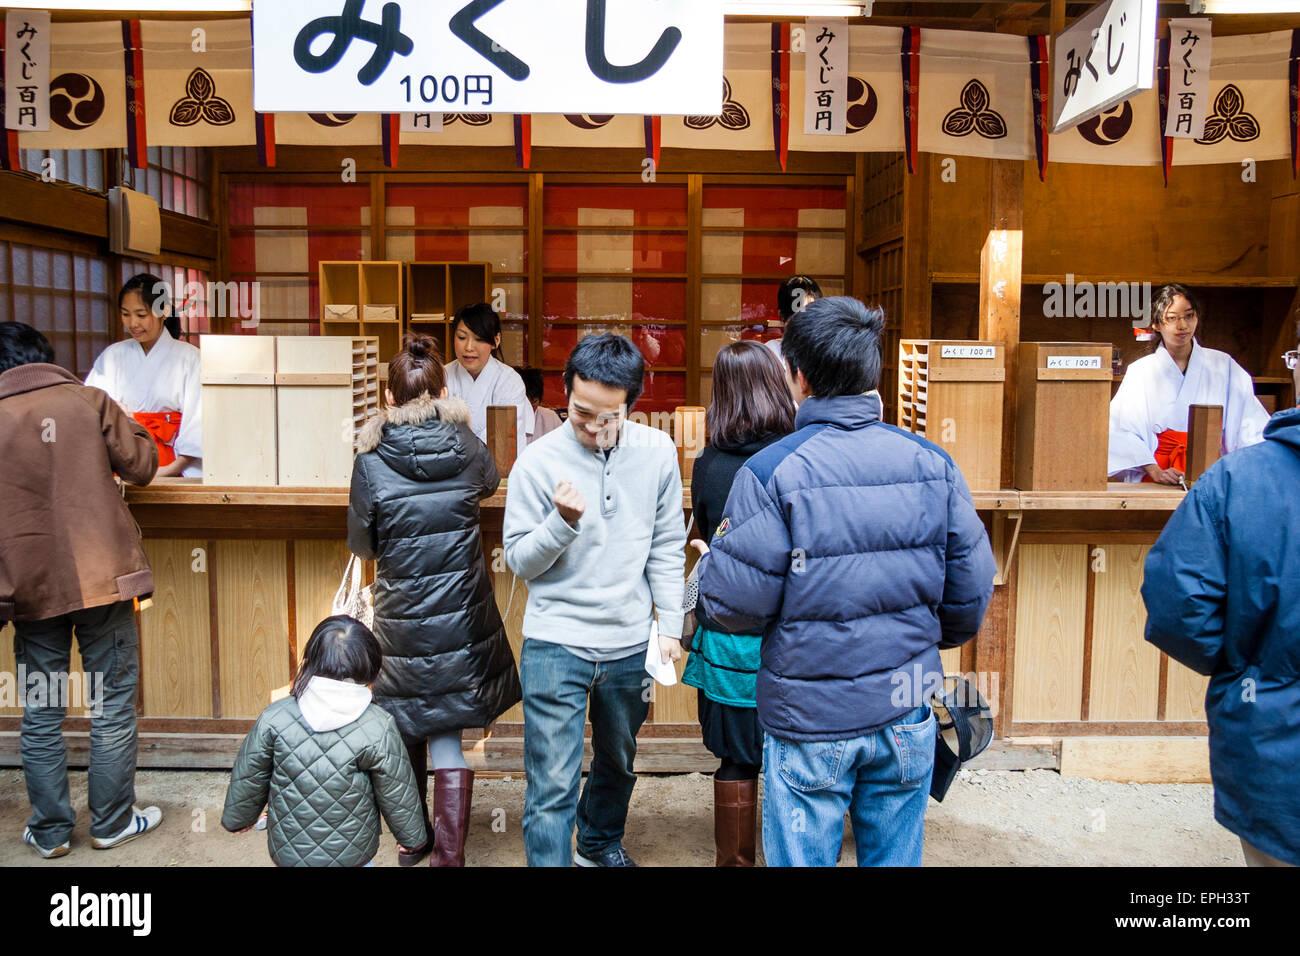 Japan, Nishinomiya shrine. New Year. People buying omikuji, during at hatsumode. One man, clenching fist, ecstatic, - Stock Image